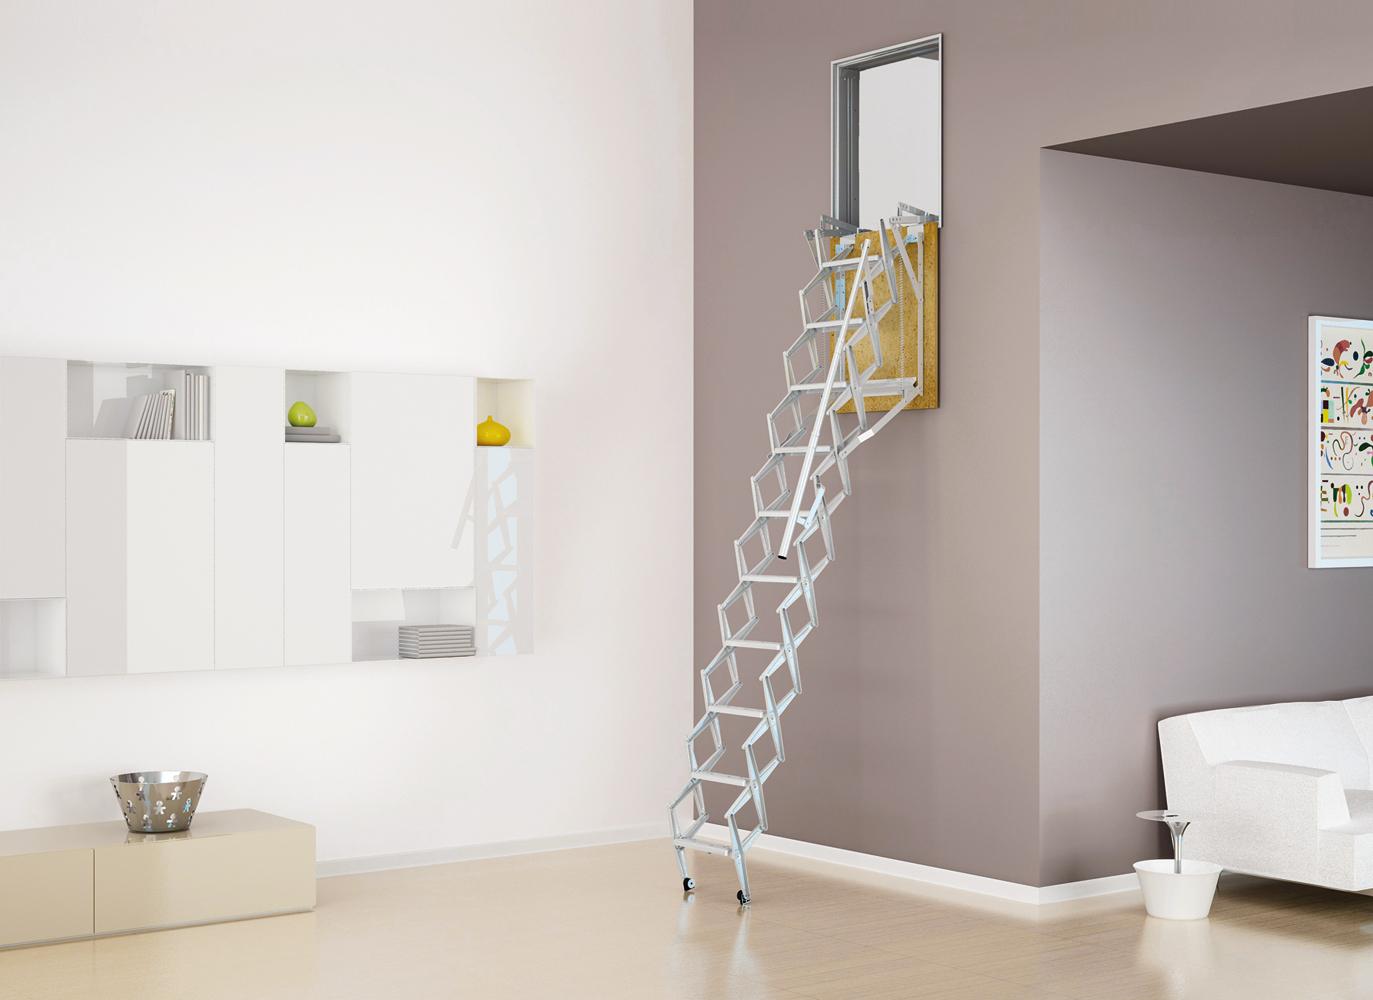 gradini a scomparsa verticali : Scala retrattile a parete, scale a scomparsa verticali